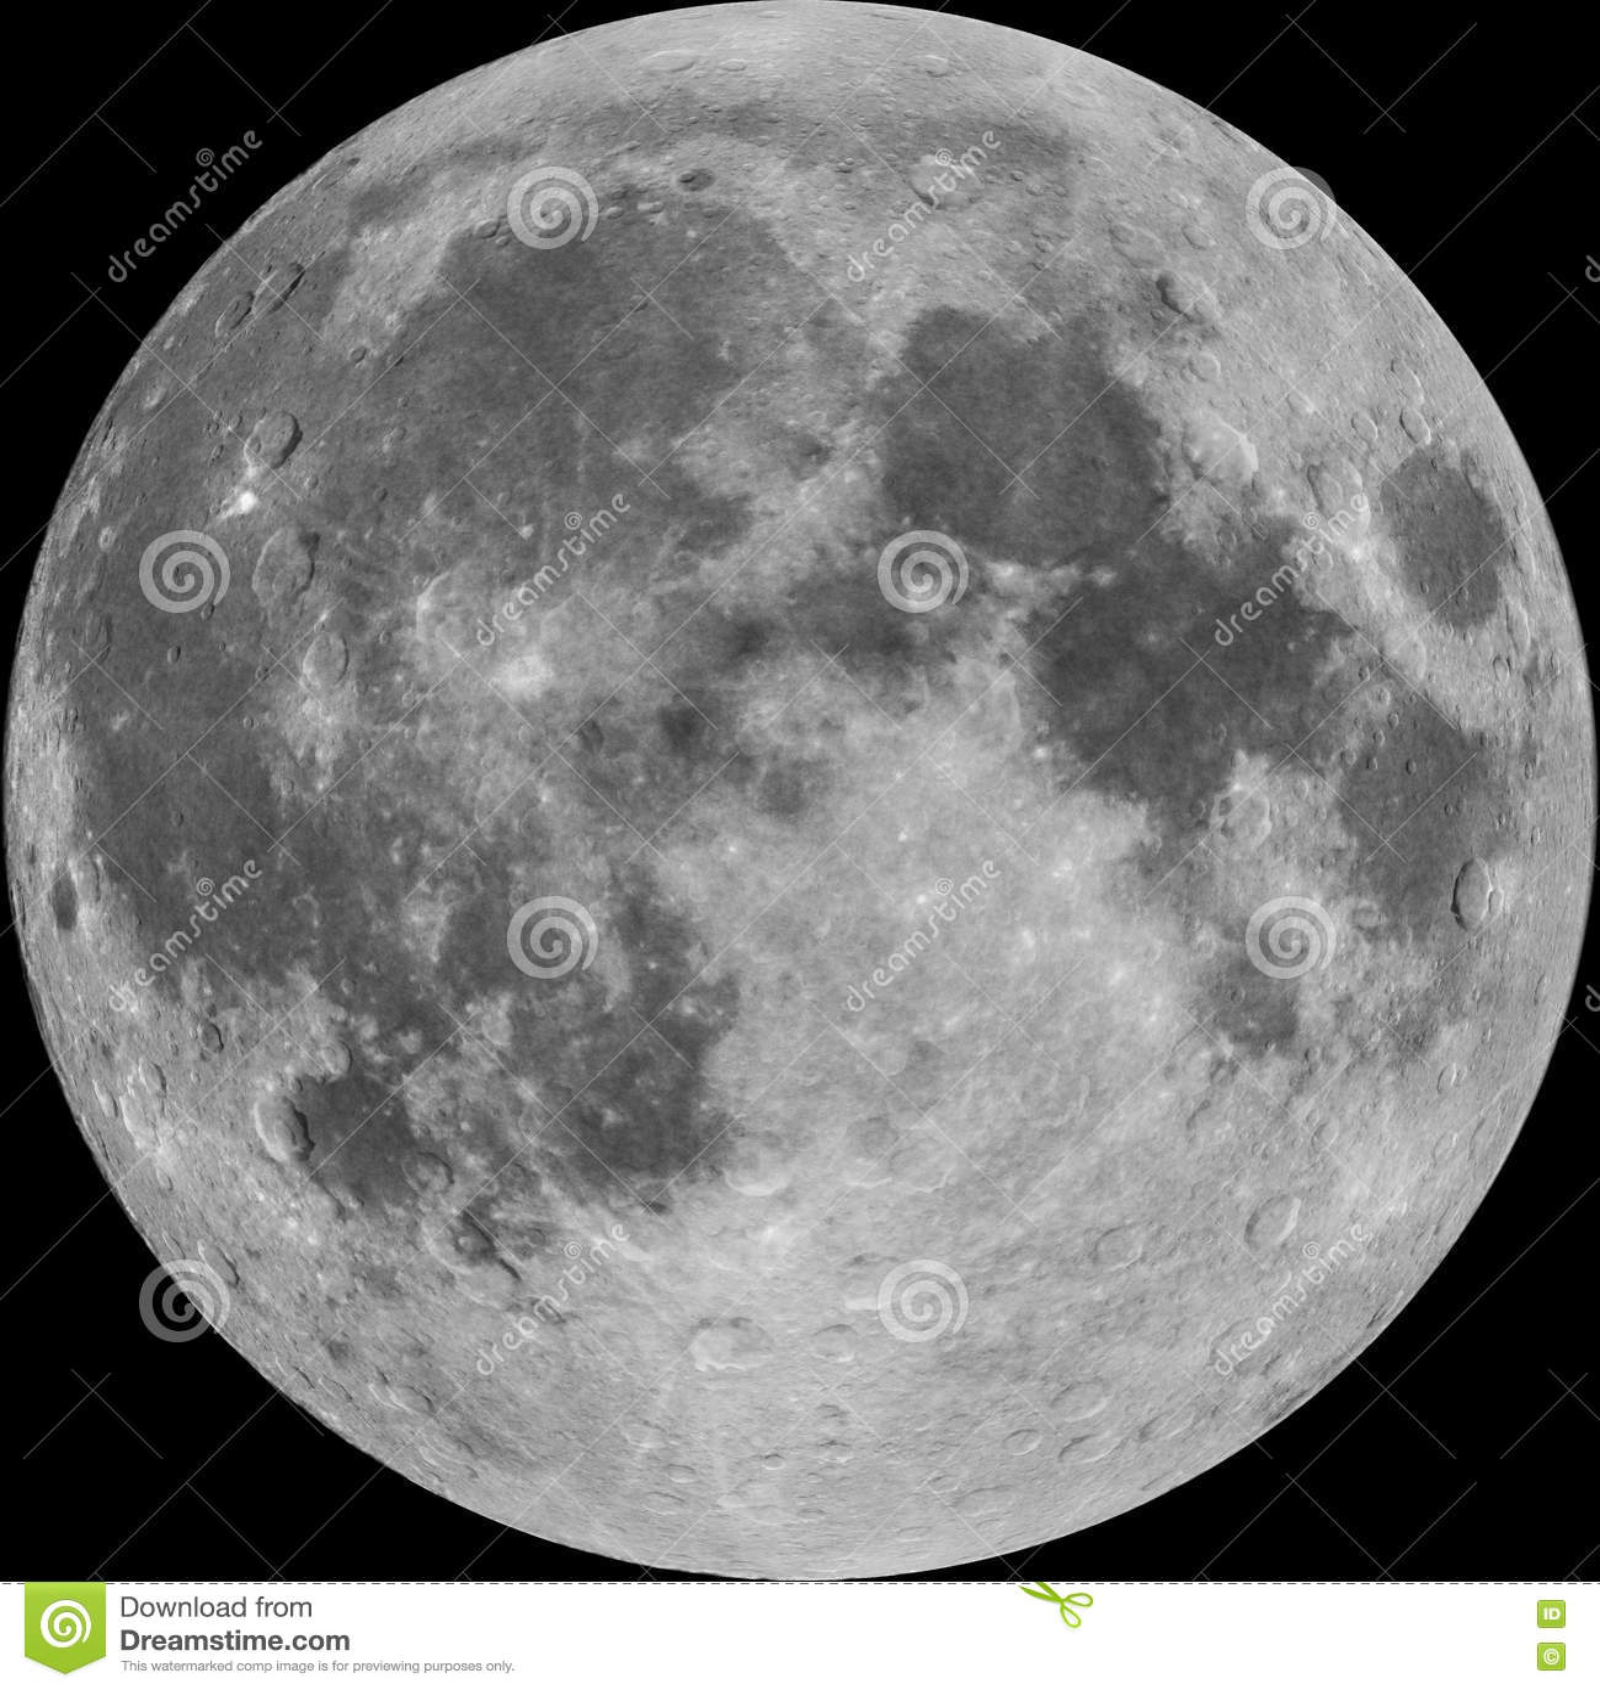 Vollmond, Foto kombinierte mit den erläuterten Kratern, lokalisiert